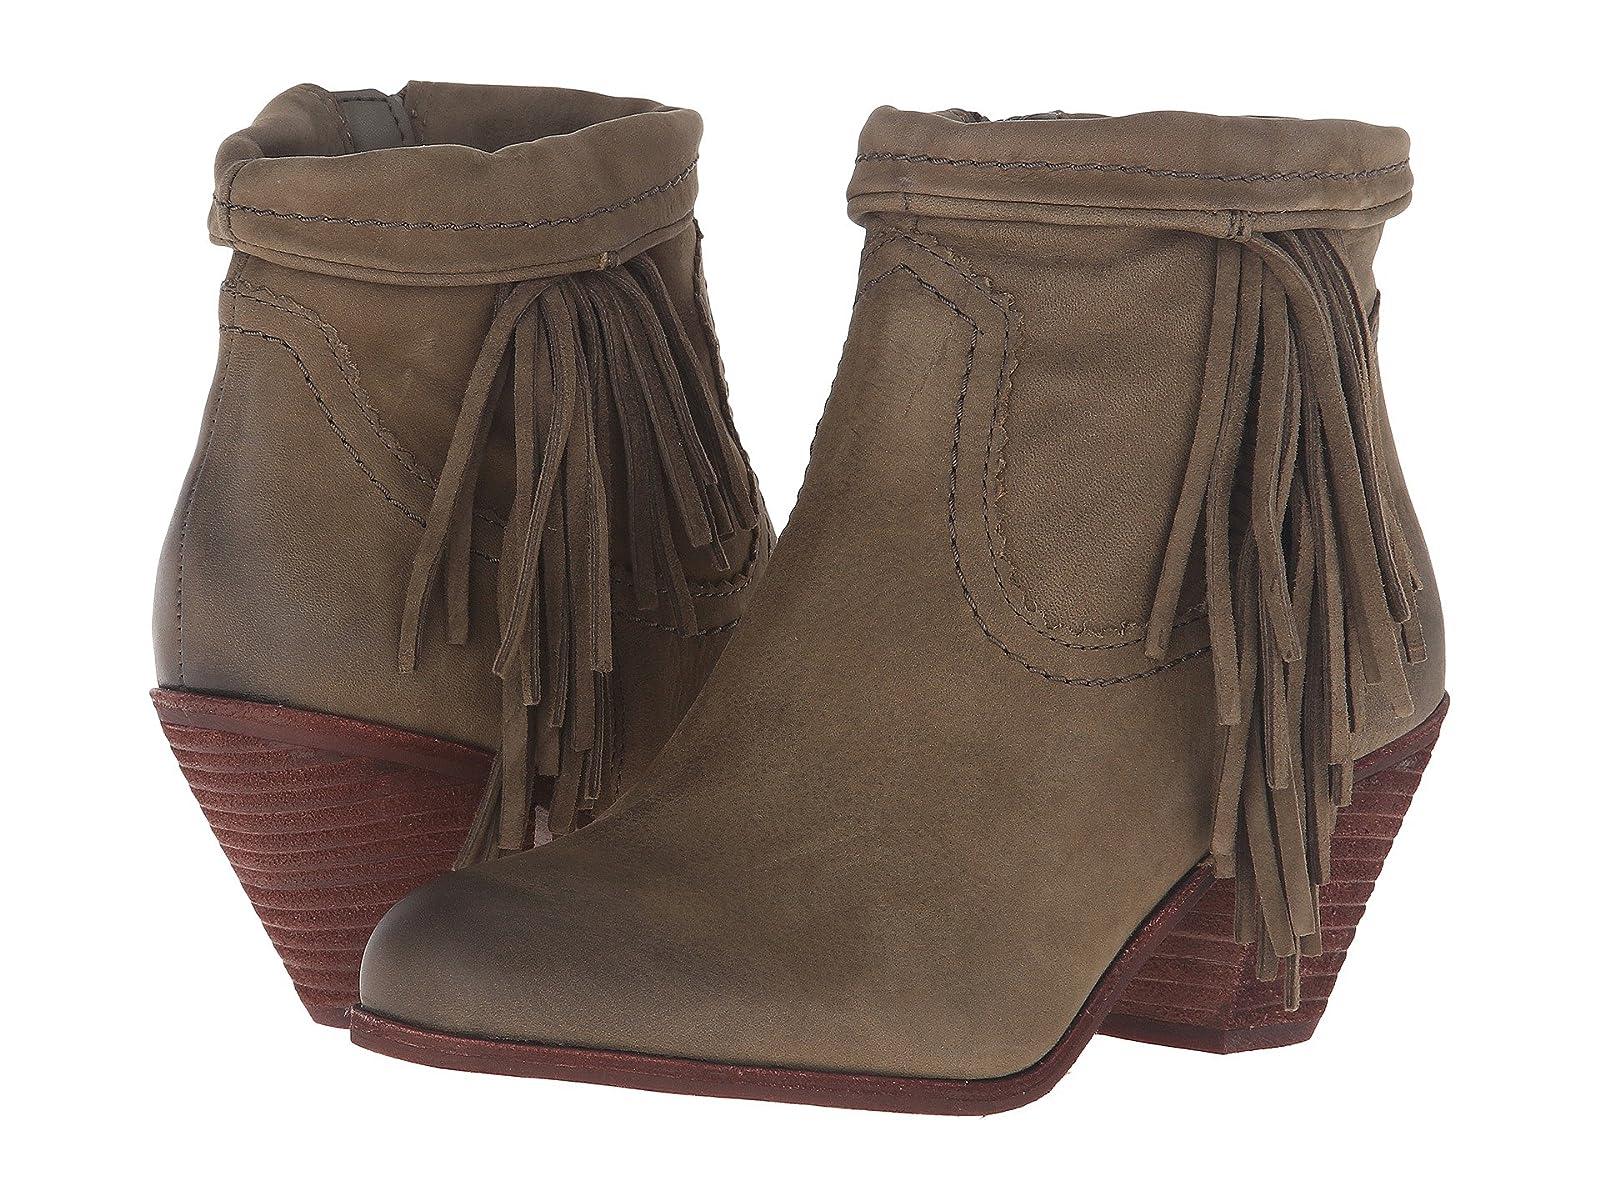 Sam Edelman LouieCheap and distinctive eye-catching shoes